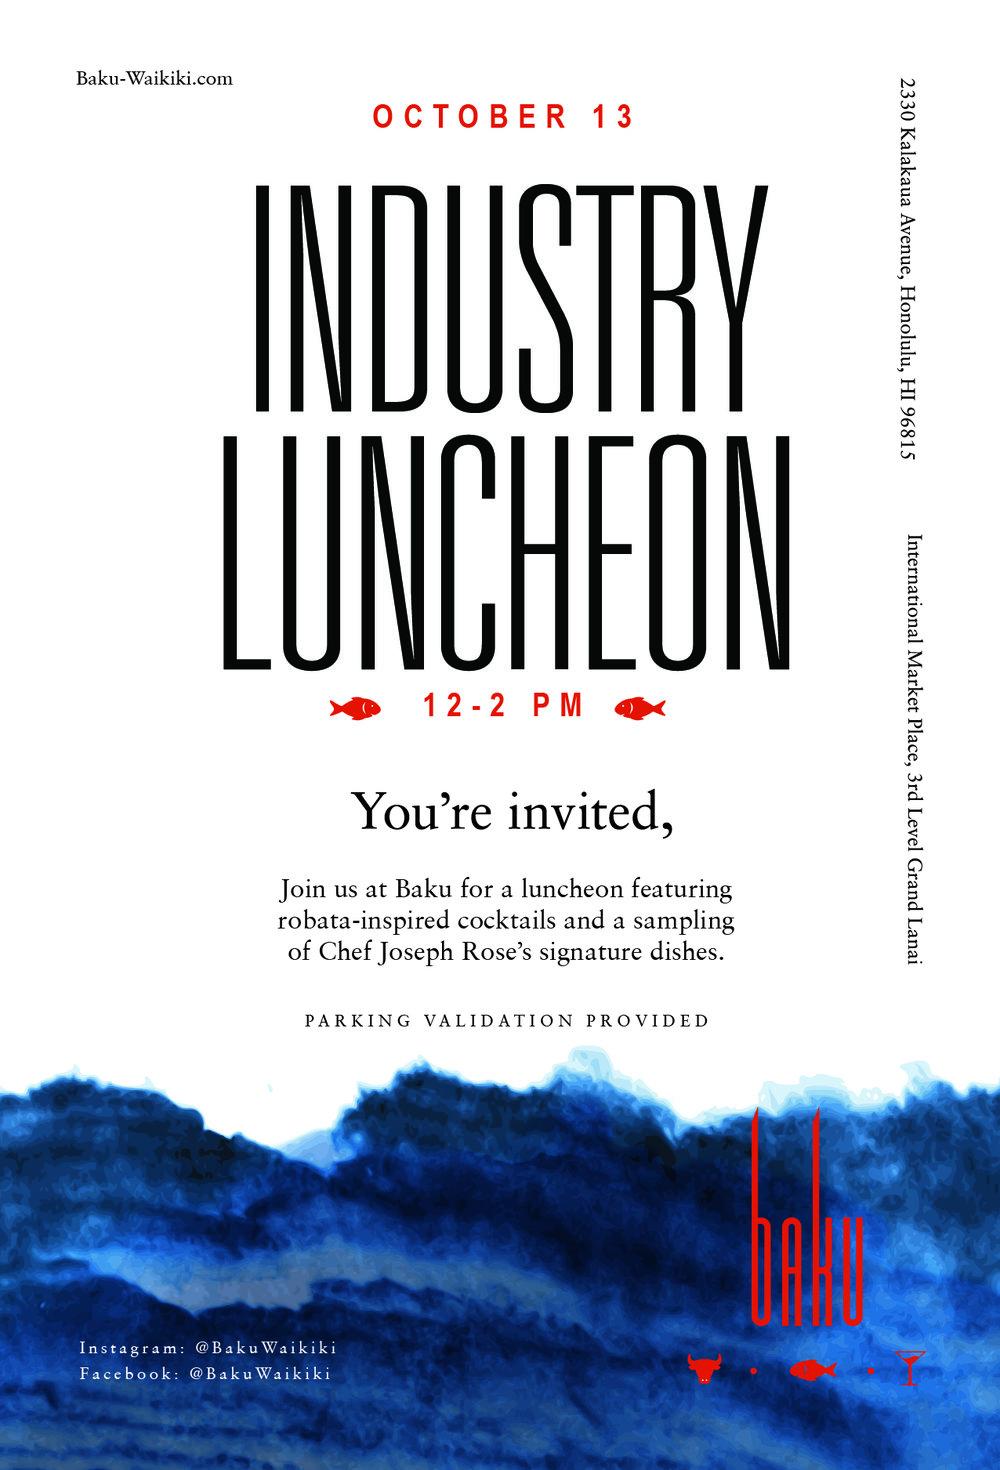 INDUSTRY LUNCHEON INVITE-01.jpg